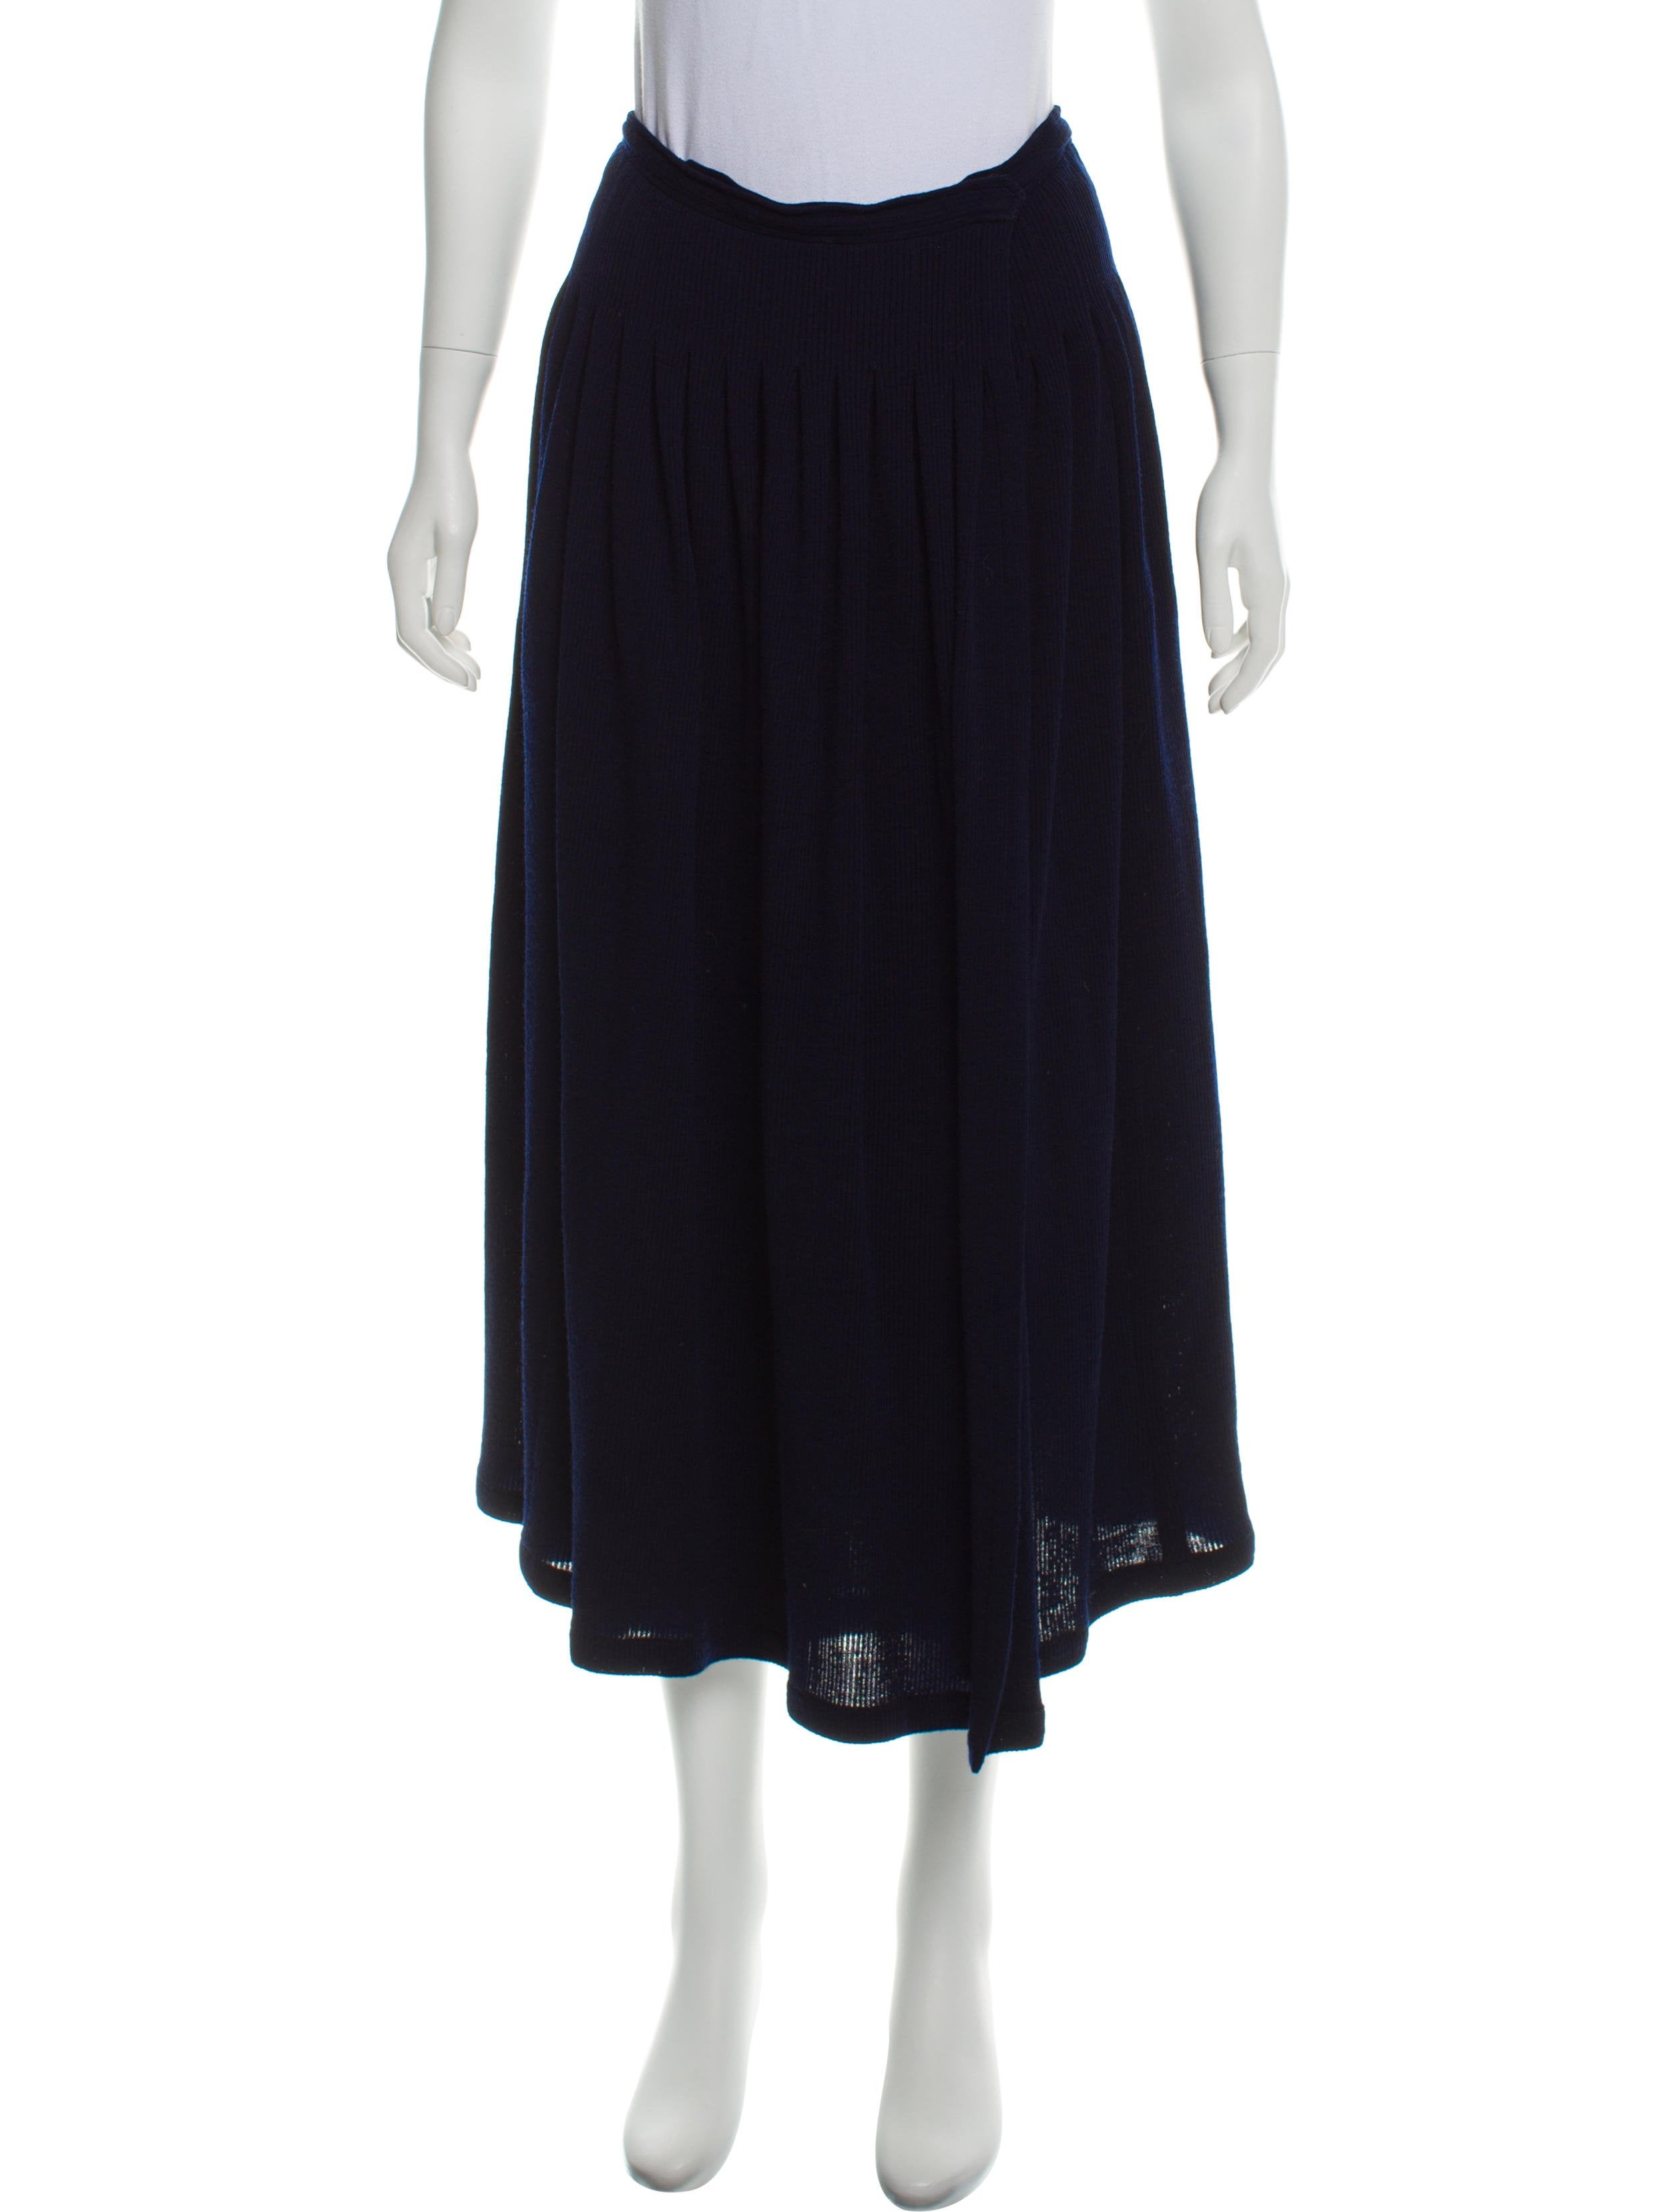 3b176de244 Yves Saint Laurent Vintage Midi Wool Skirt - Clothing - YVE92475 ...